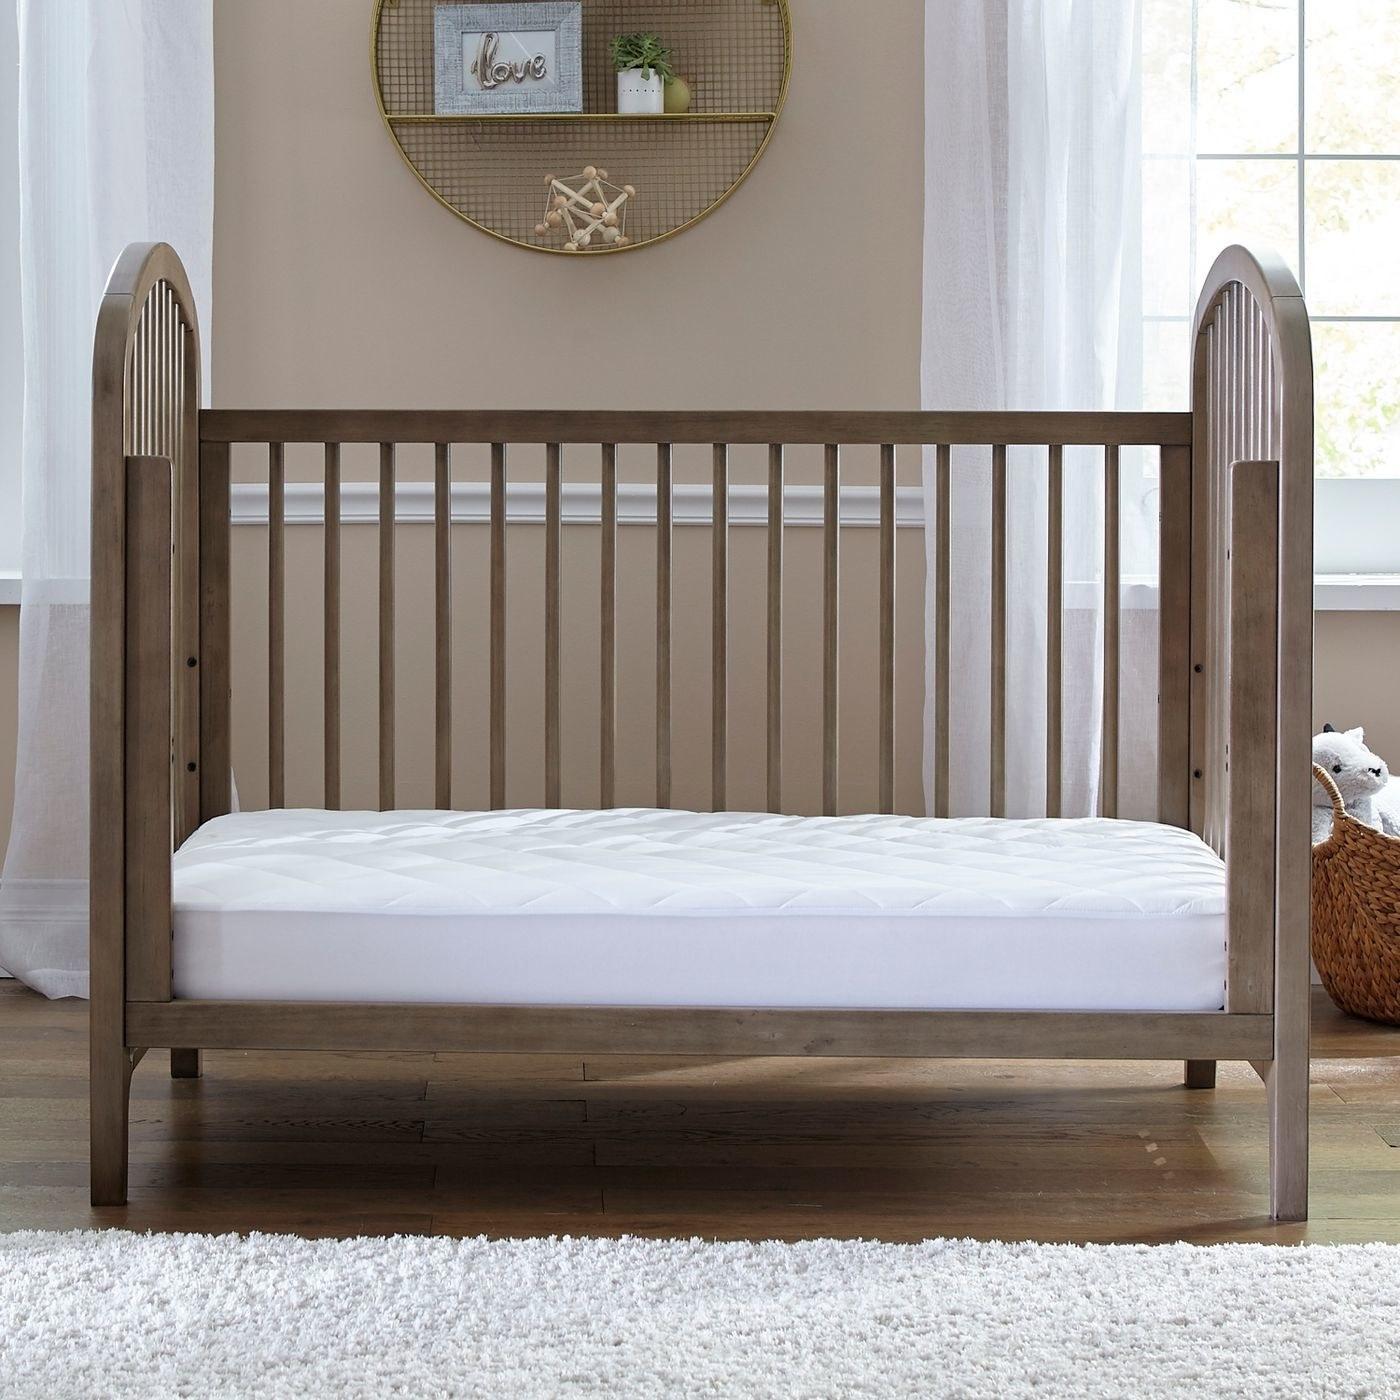 The crib mattress pad in a crib